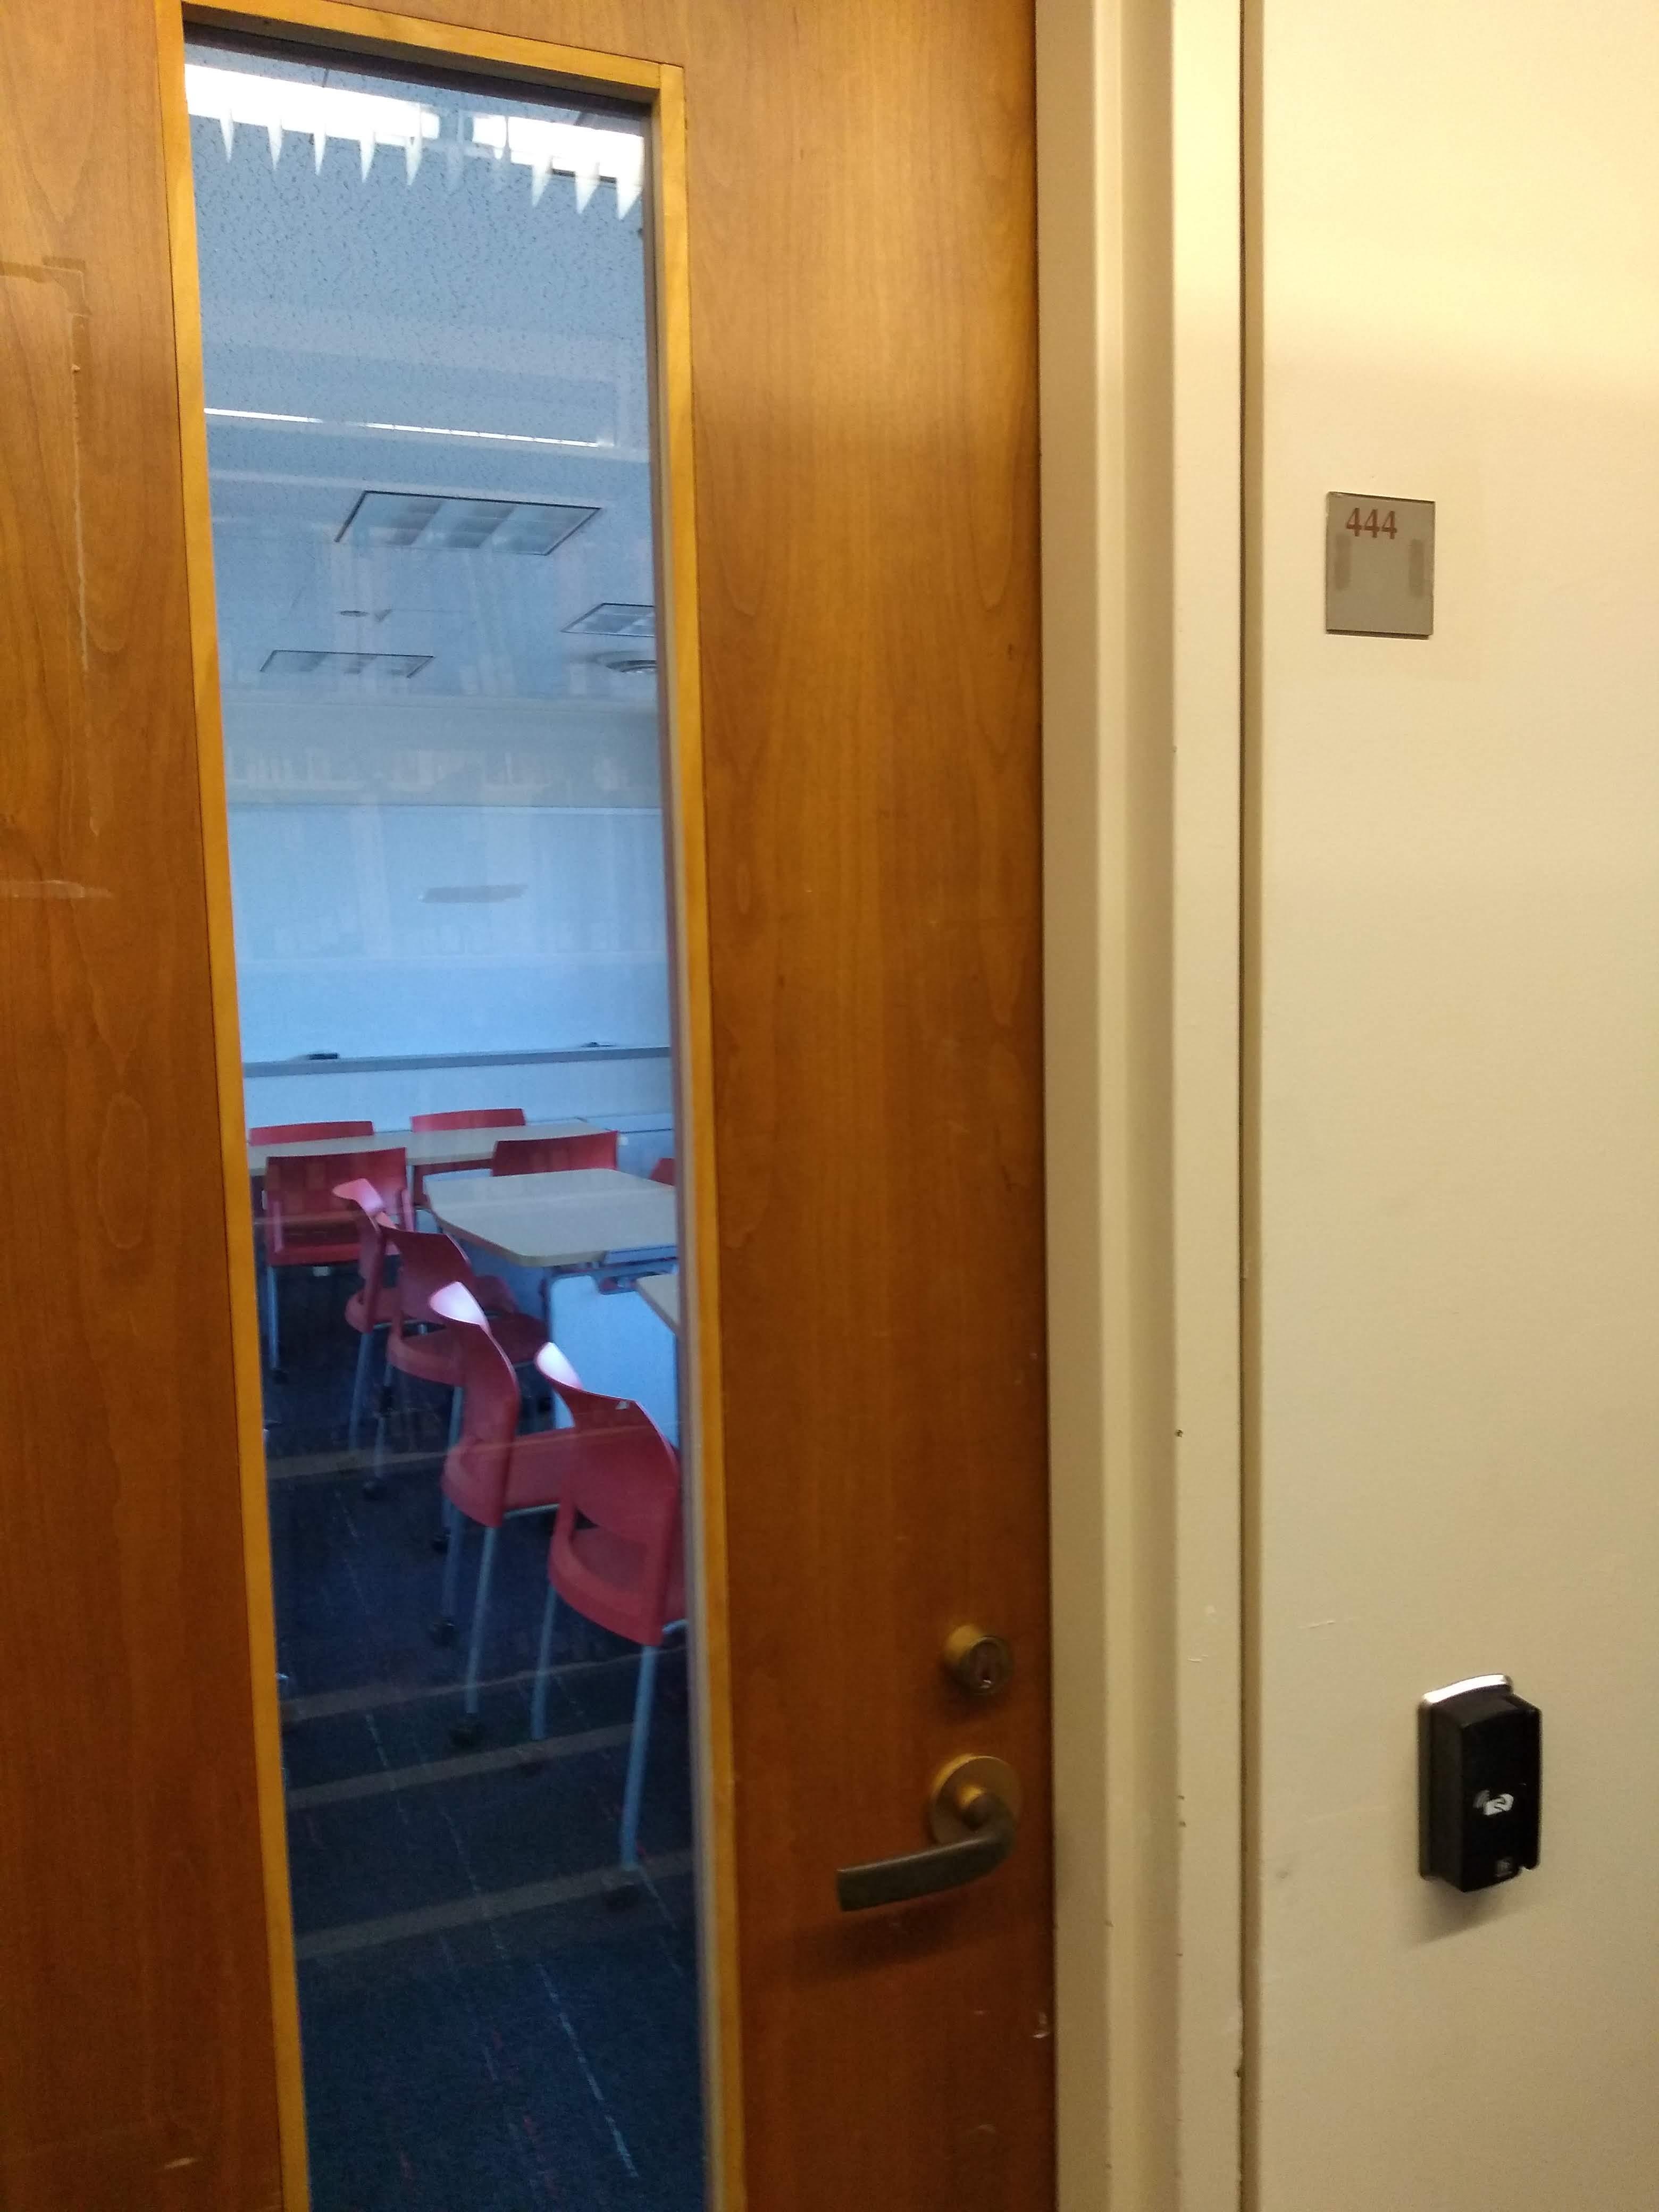 Classroom 444